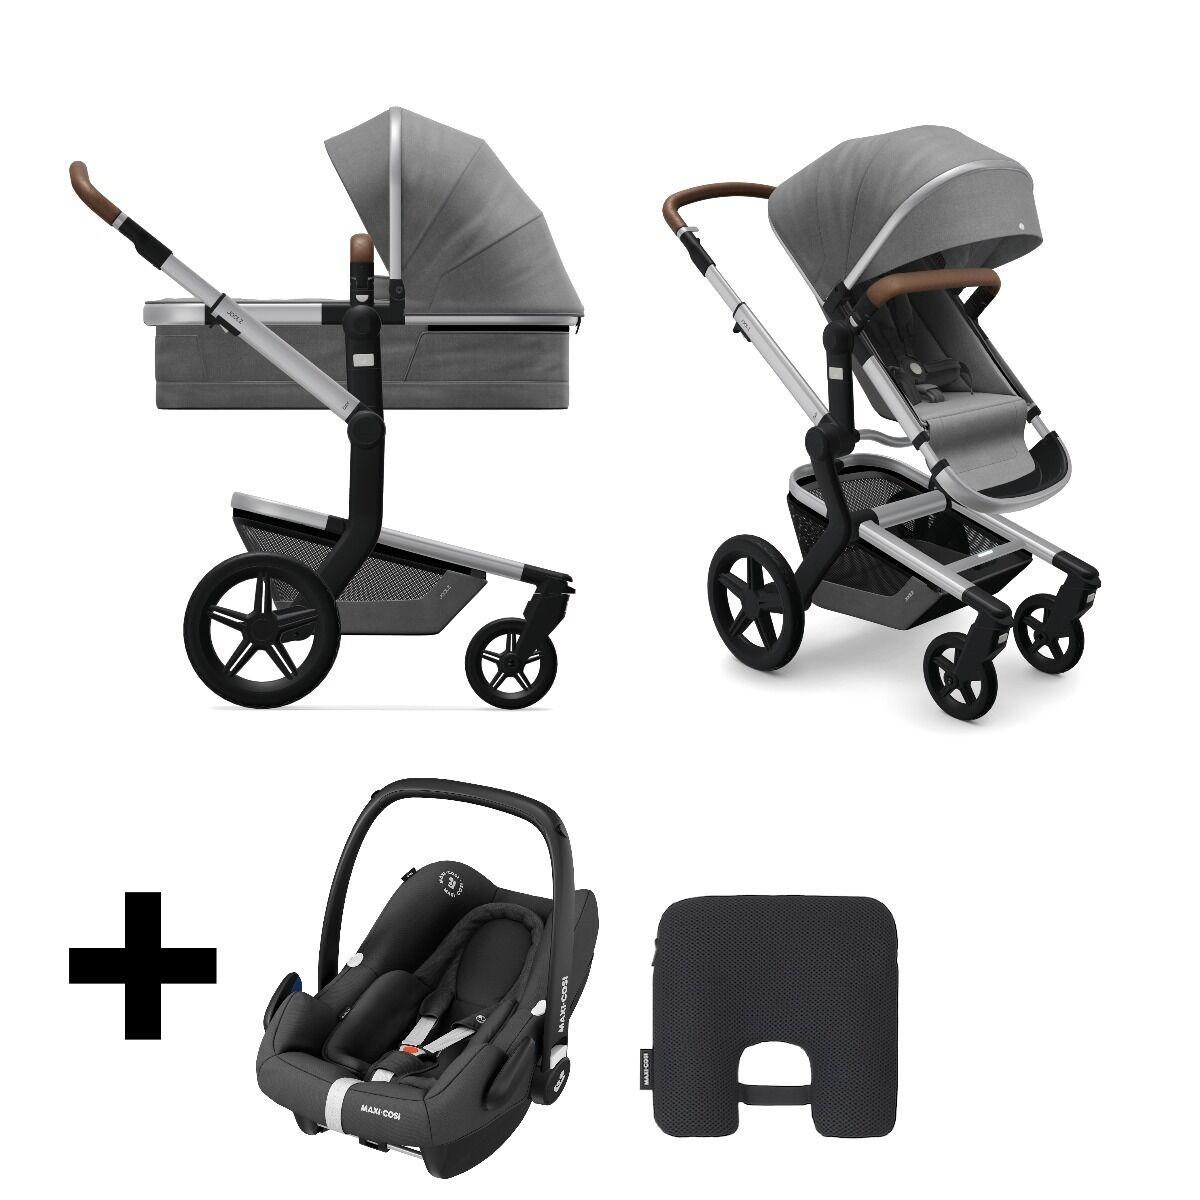 Joolz  2 in 1 Kinderwagen Day + Radiant Grey + Maxi Cosi Autostoel Black + Maxi Cosi E safety Cushion